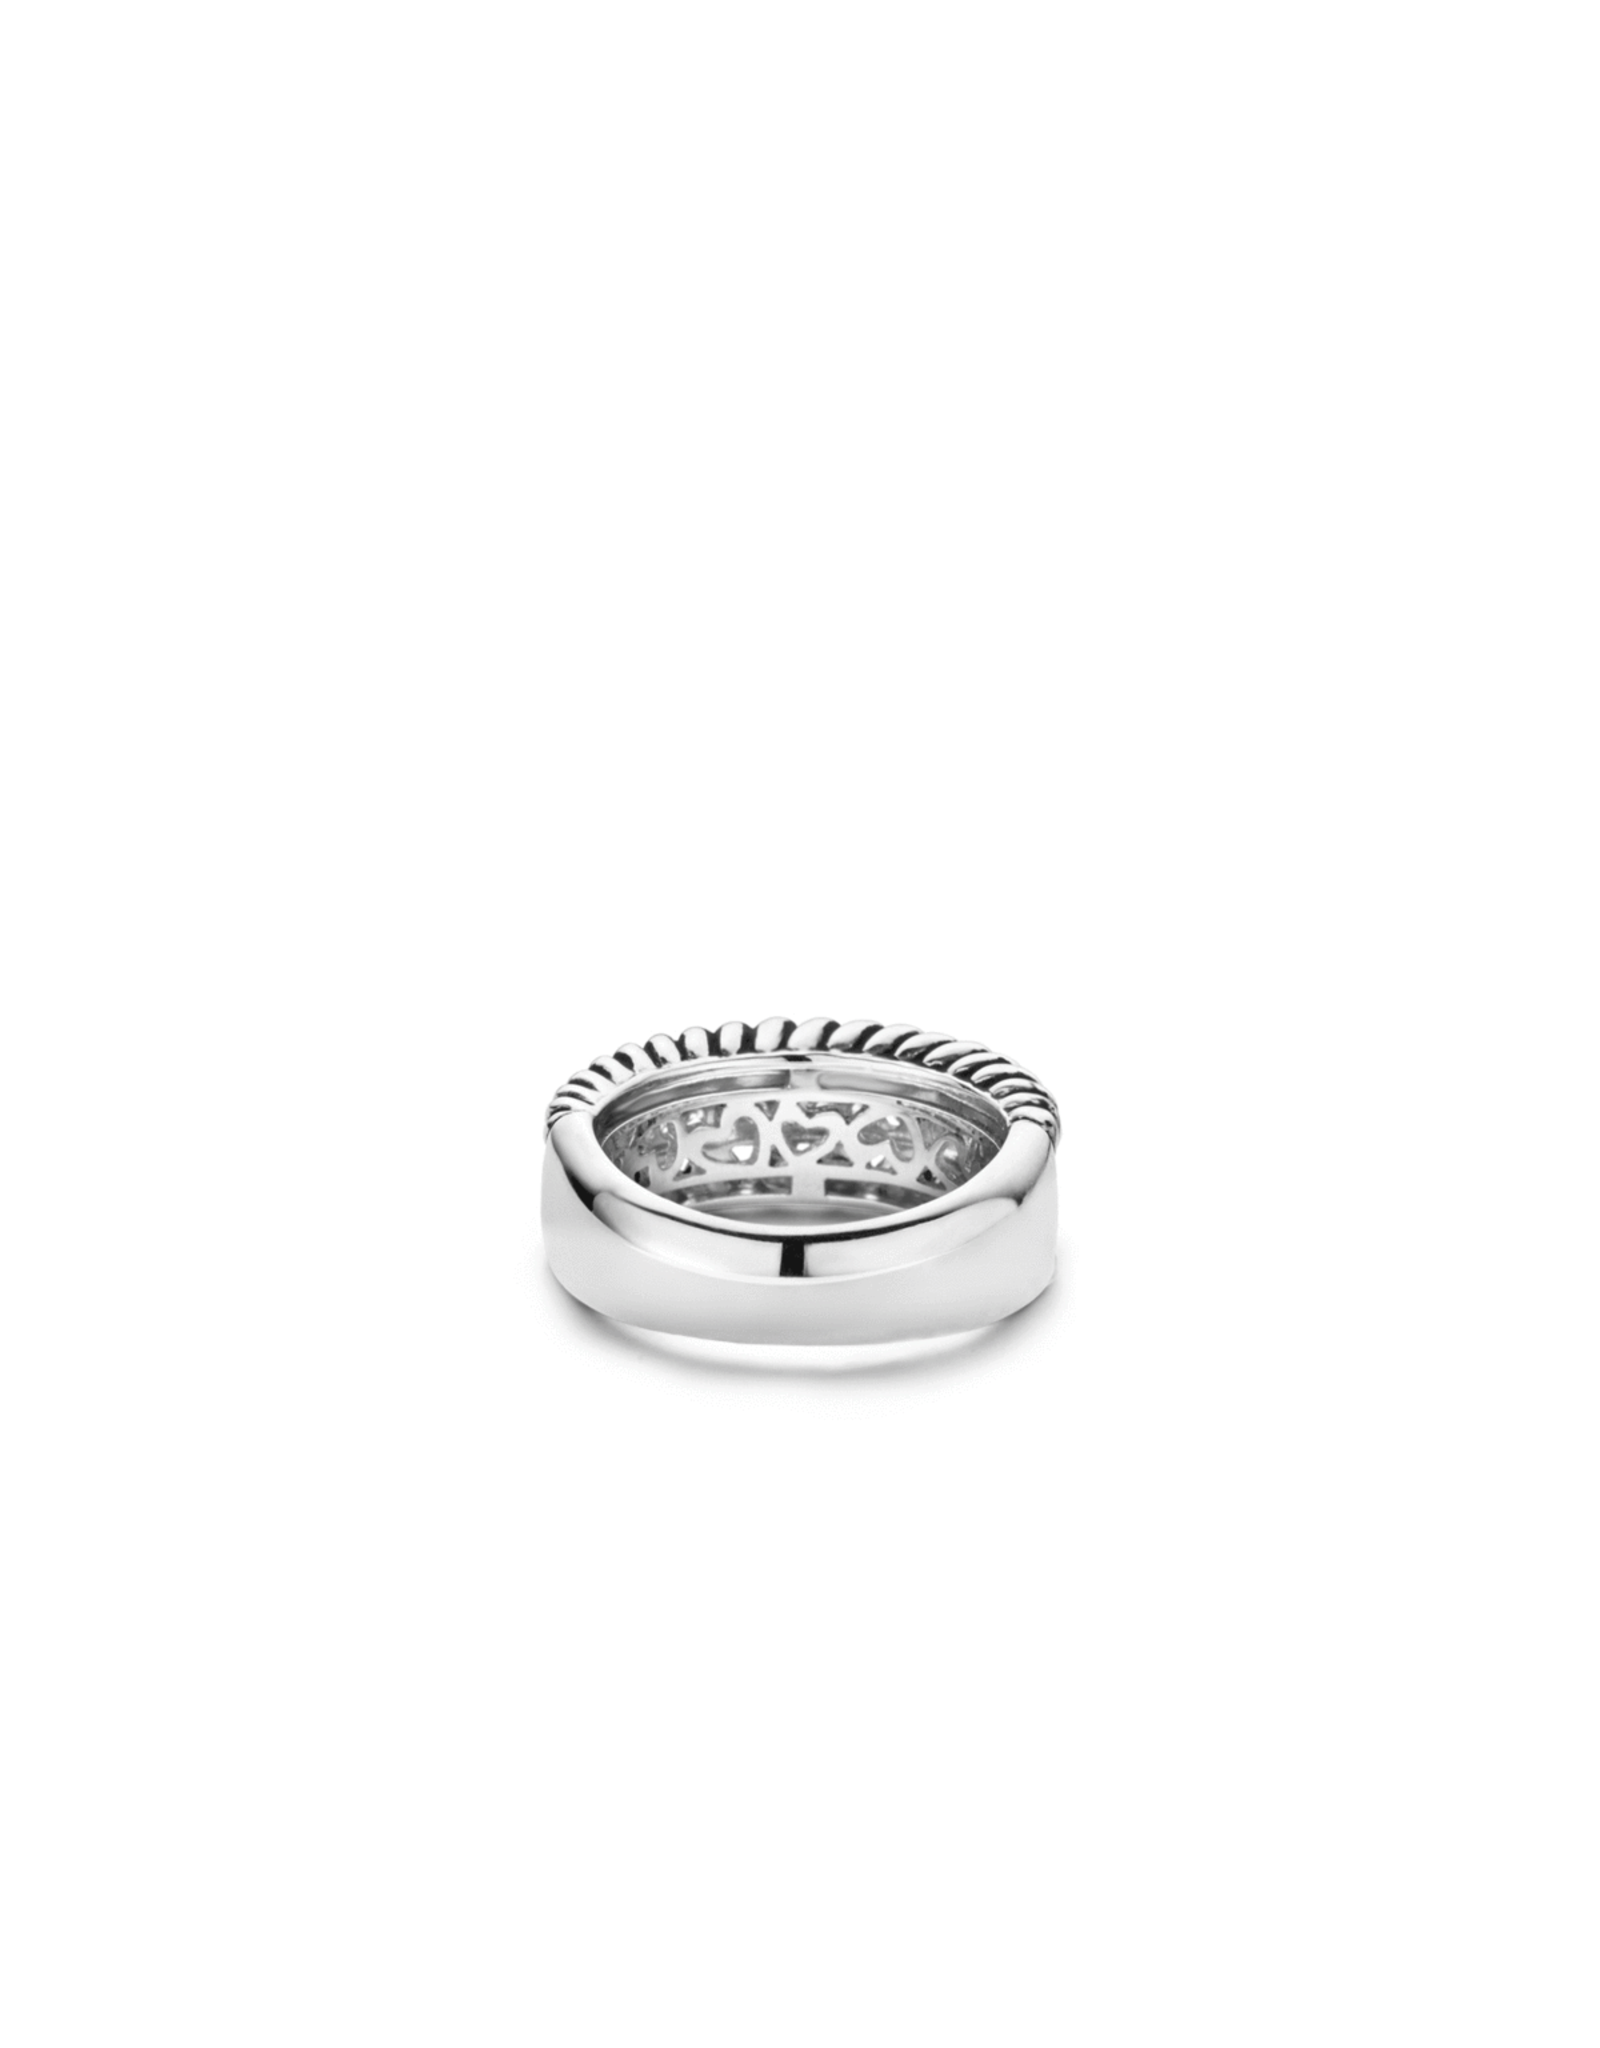 Triple Row Iconic Ti Sento Ring- 1836ZI/54